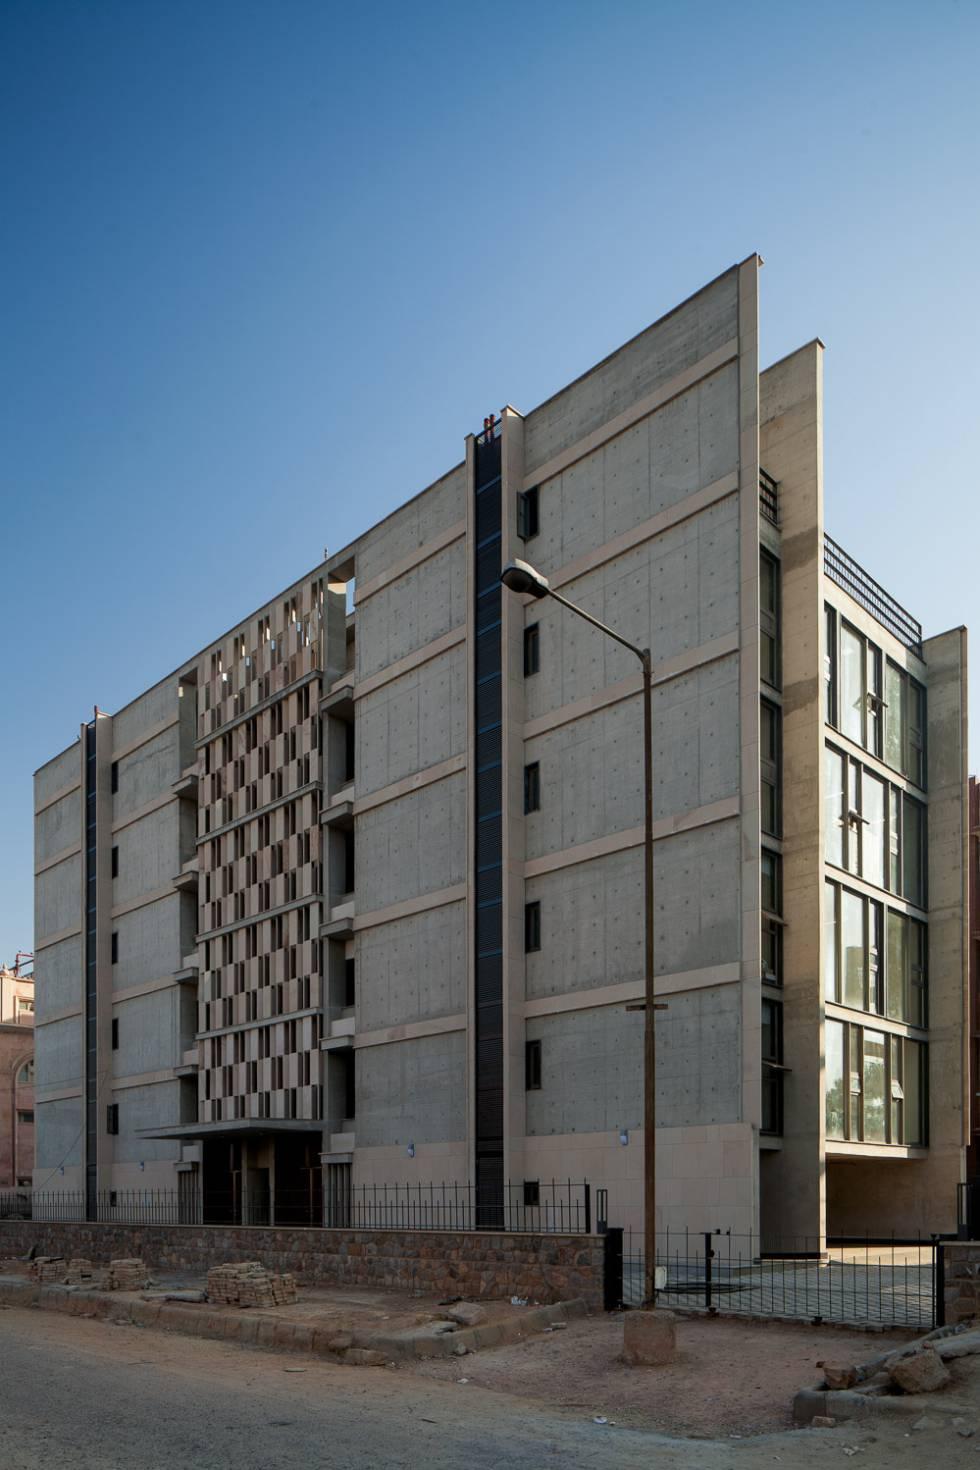 Arquitectura racional frente a arquitectura racionalista for Arquitectura racionalista